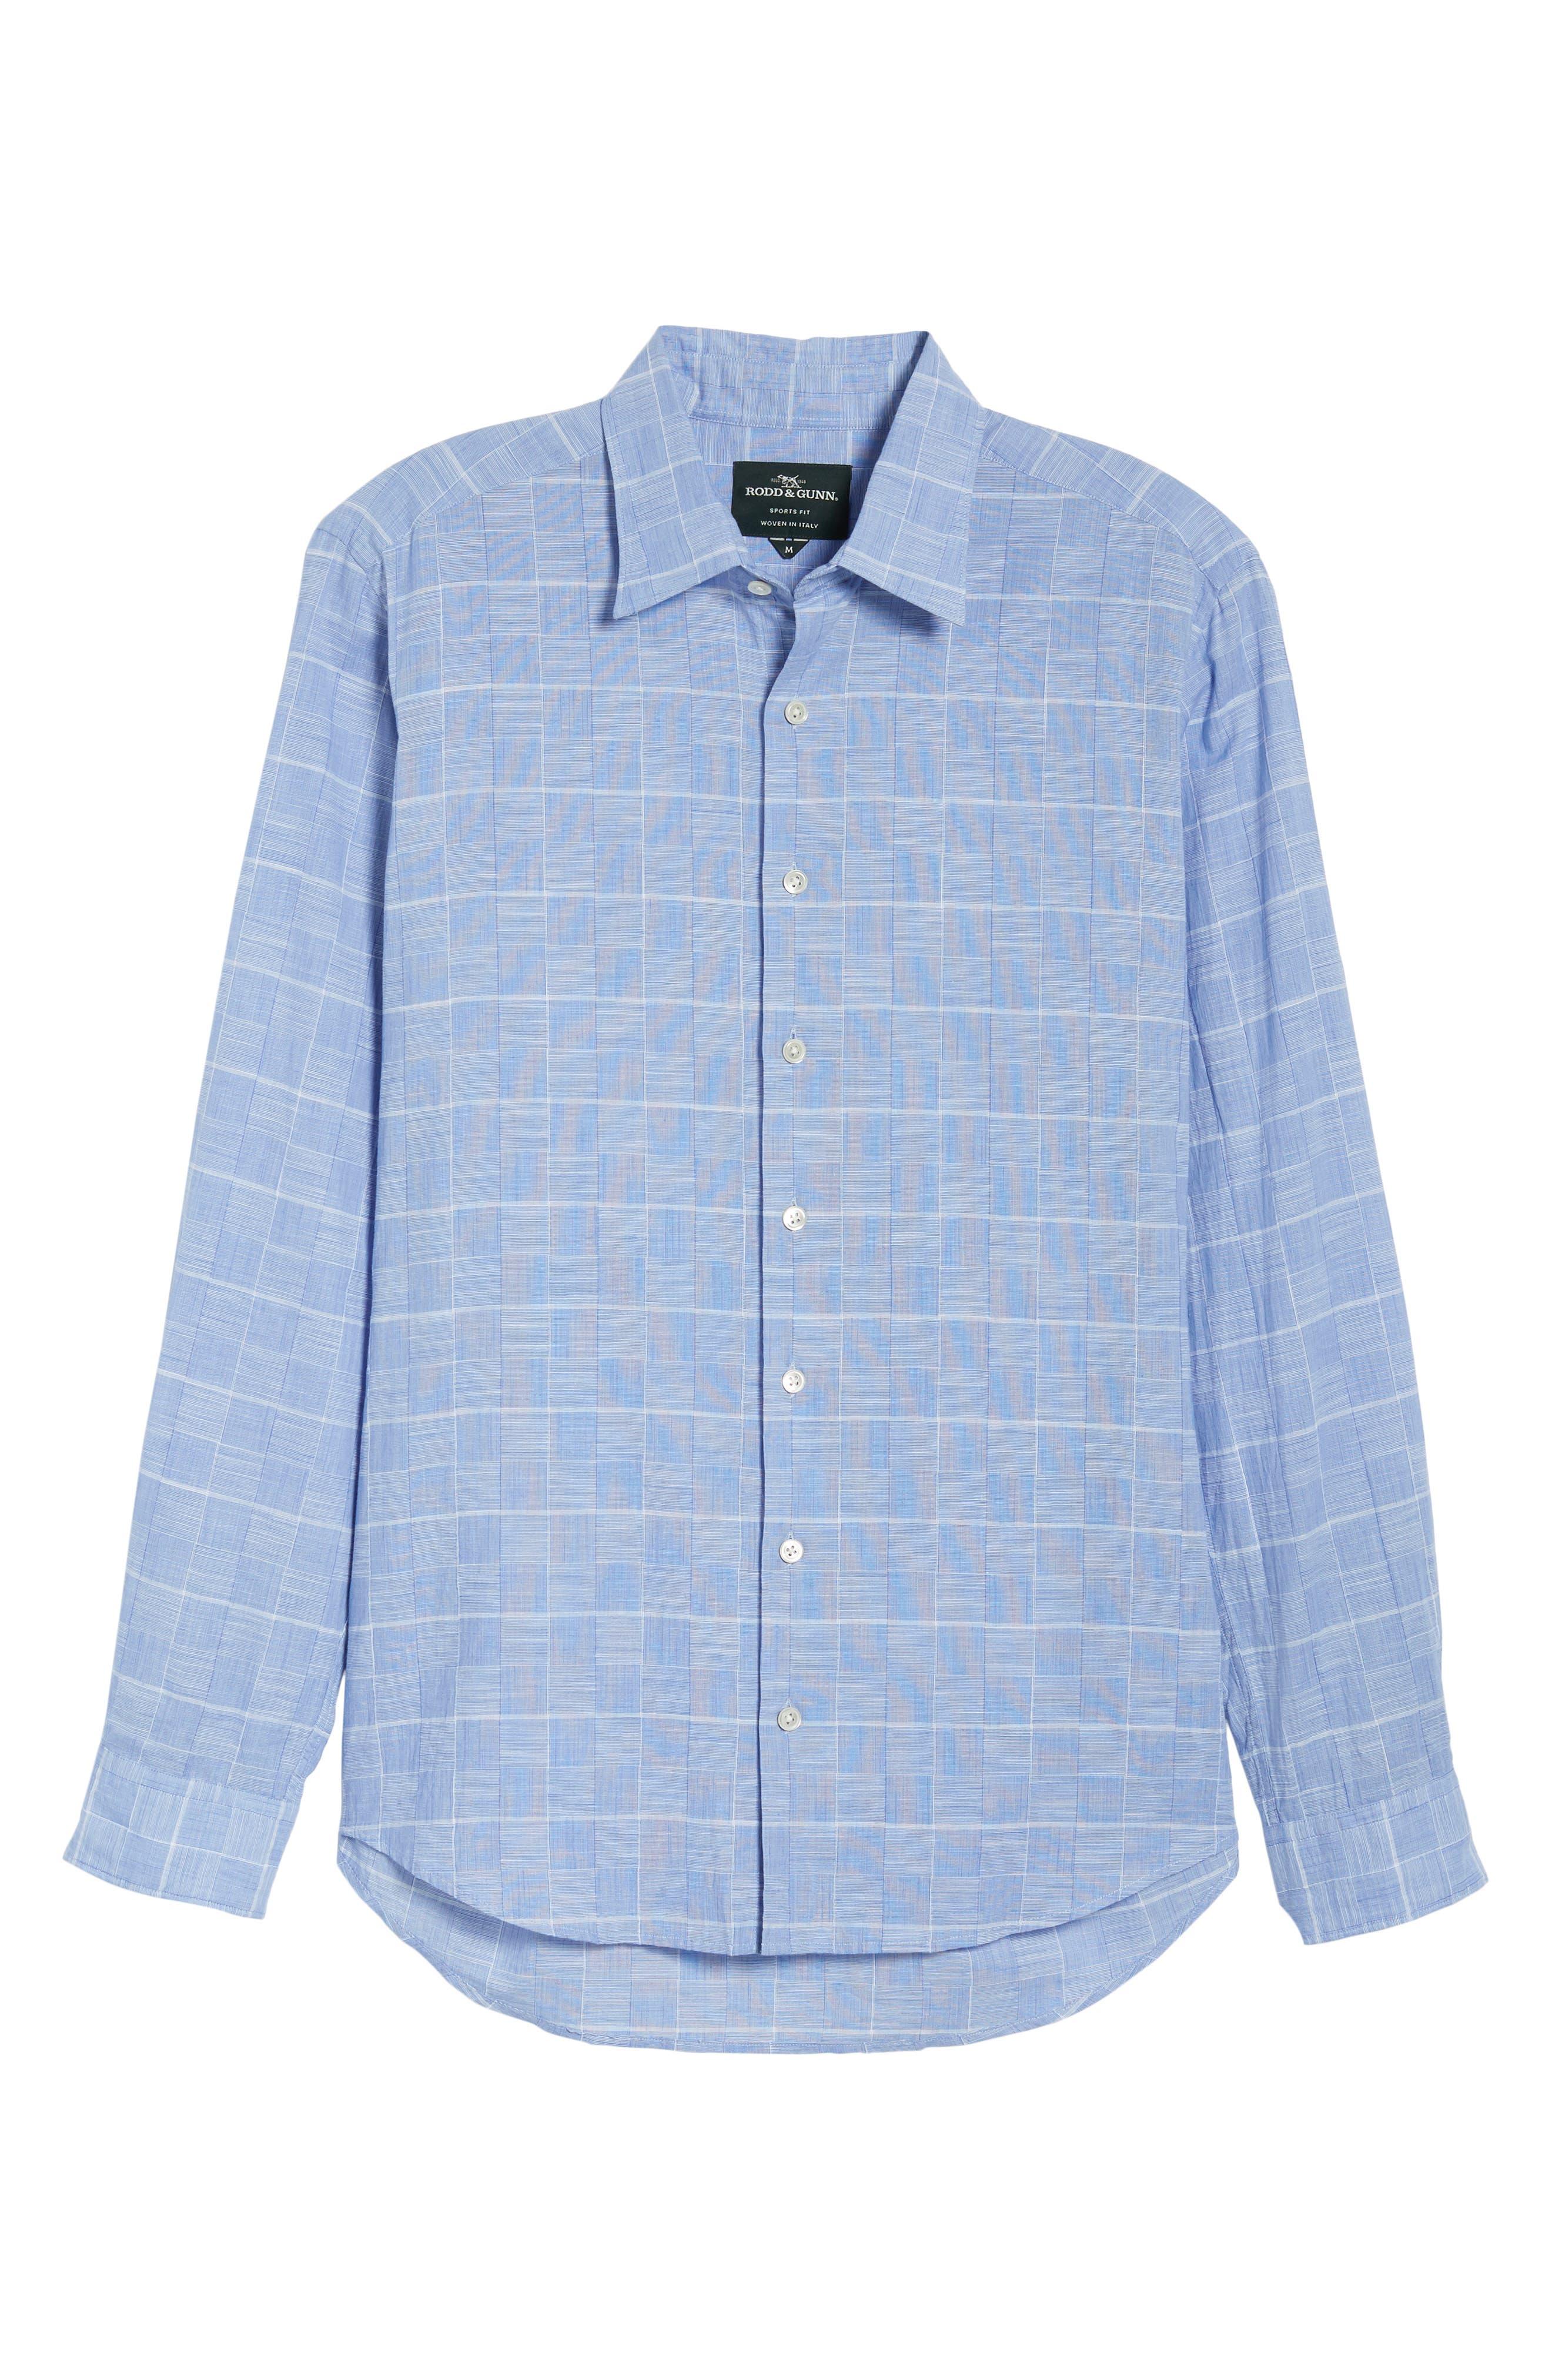 Tussock Creek Regular Fit Check Sport Shirt,                             Alternate thumbnail 6, color,                             Azure